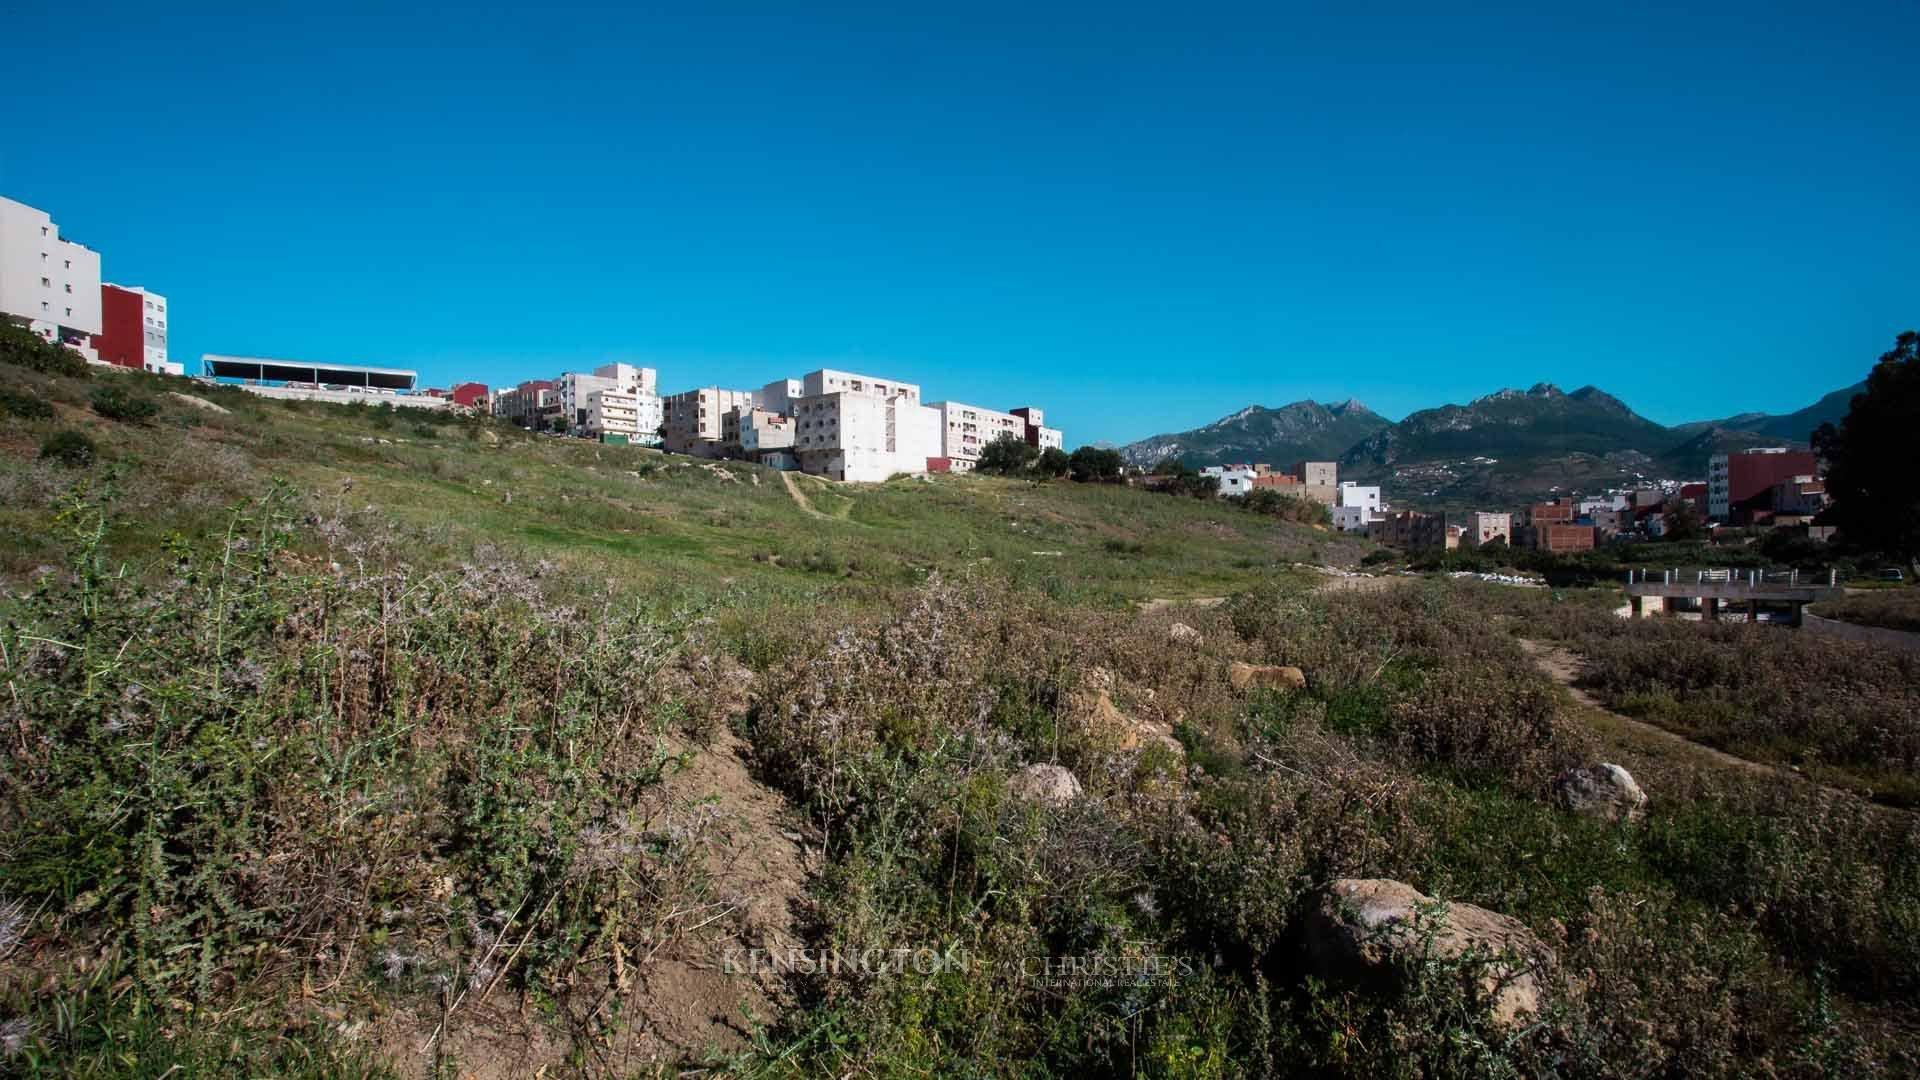 KPPM01239: Terrain Tetouan 3 Terrain constructible Tétouan Maroc